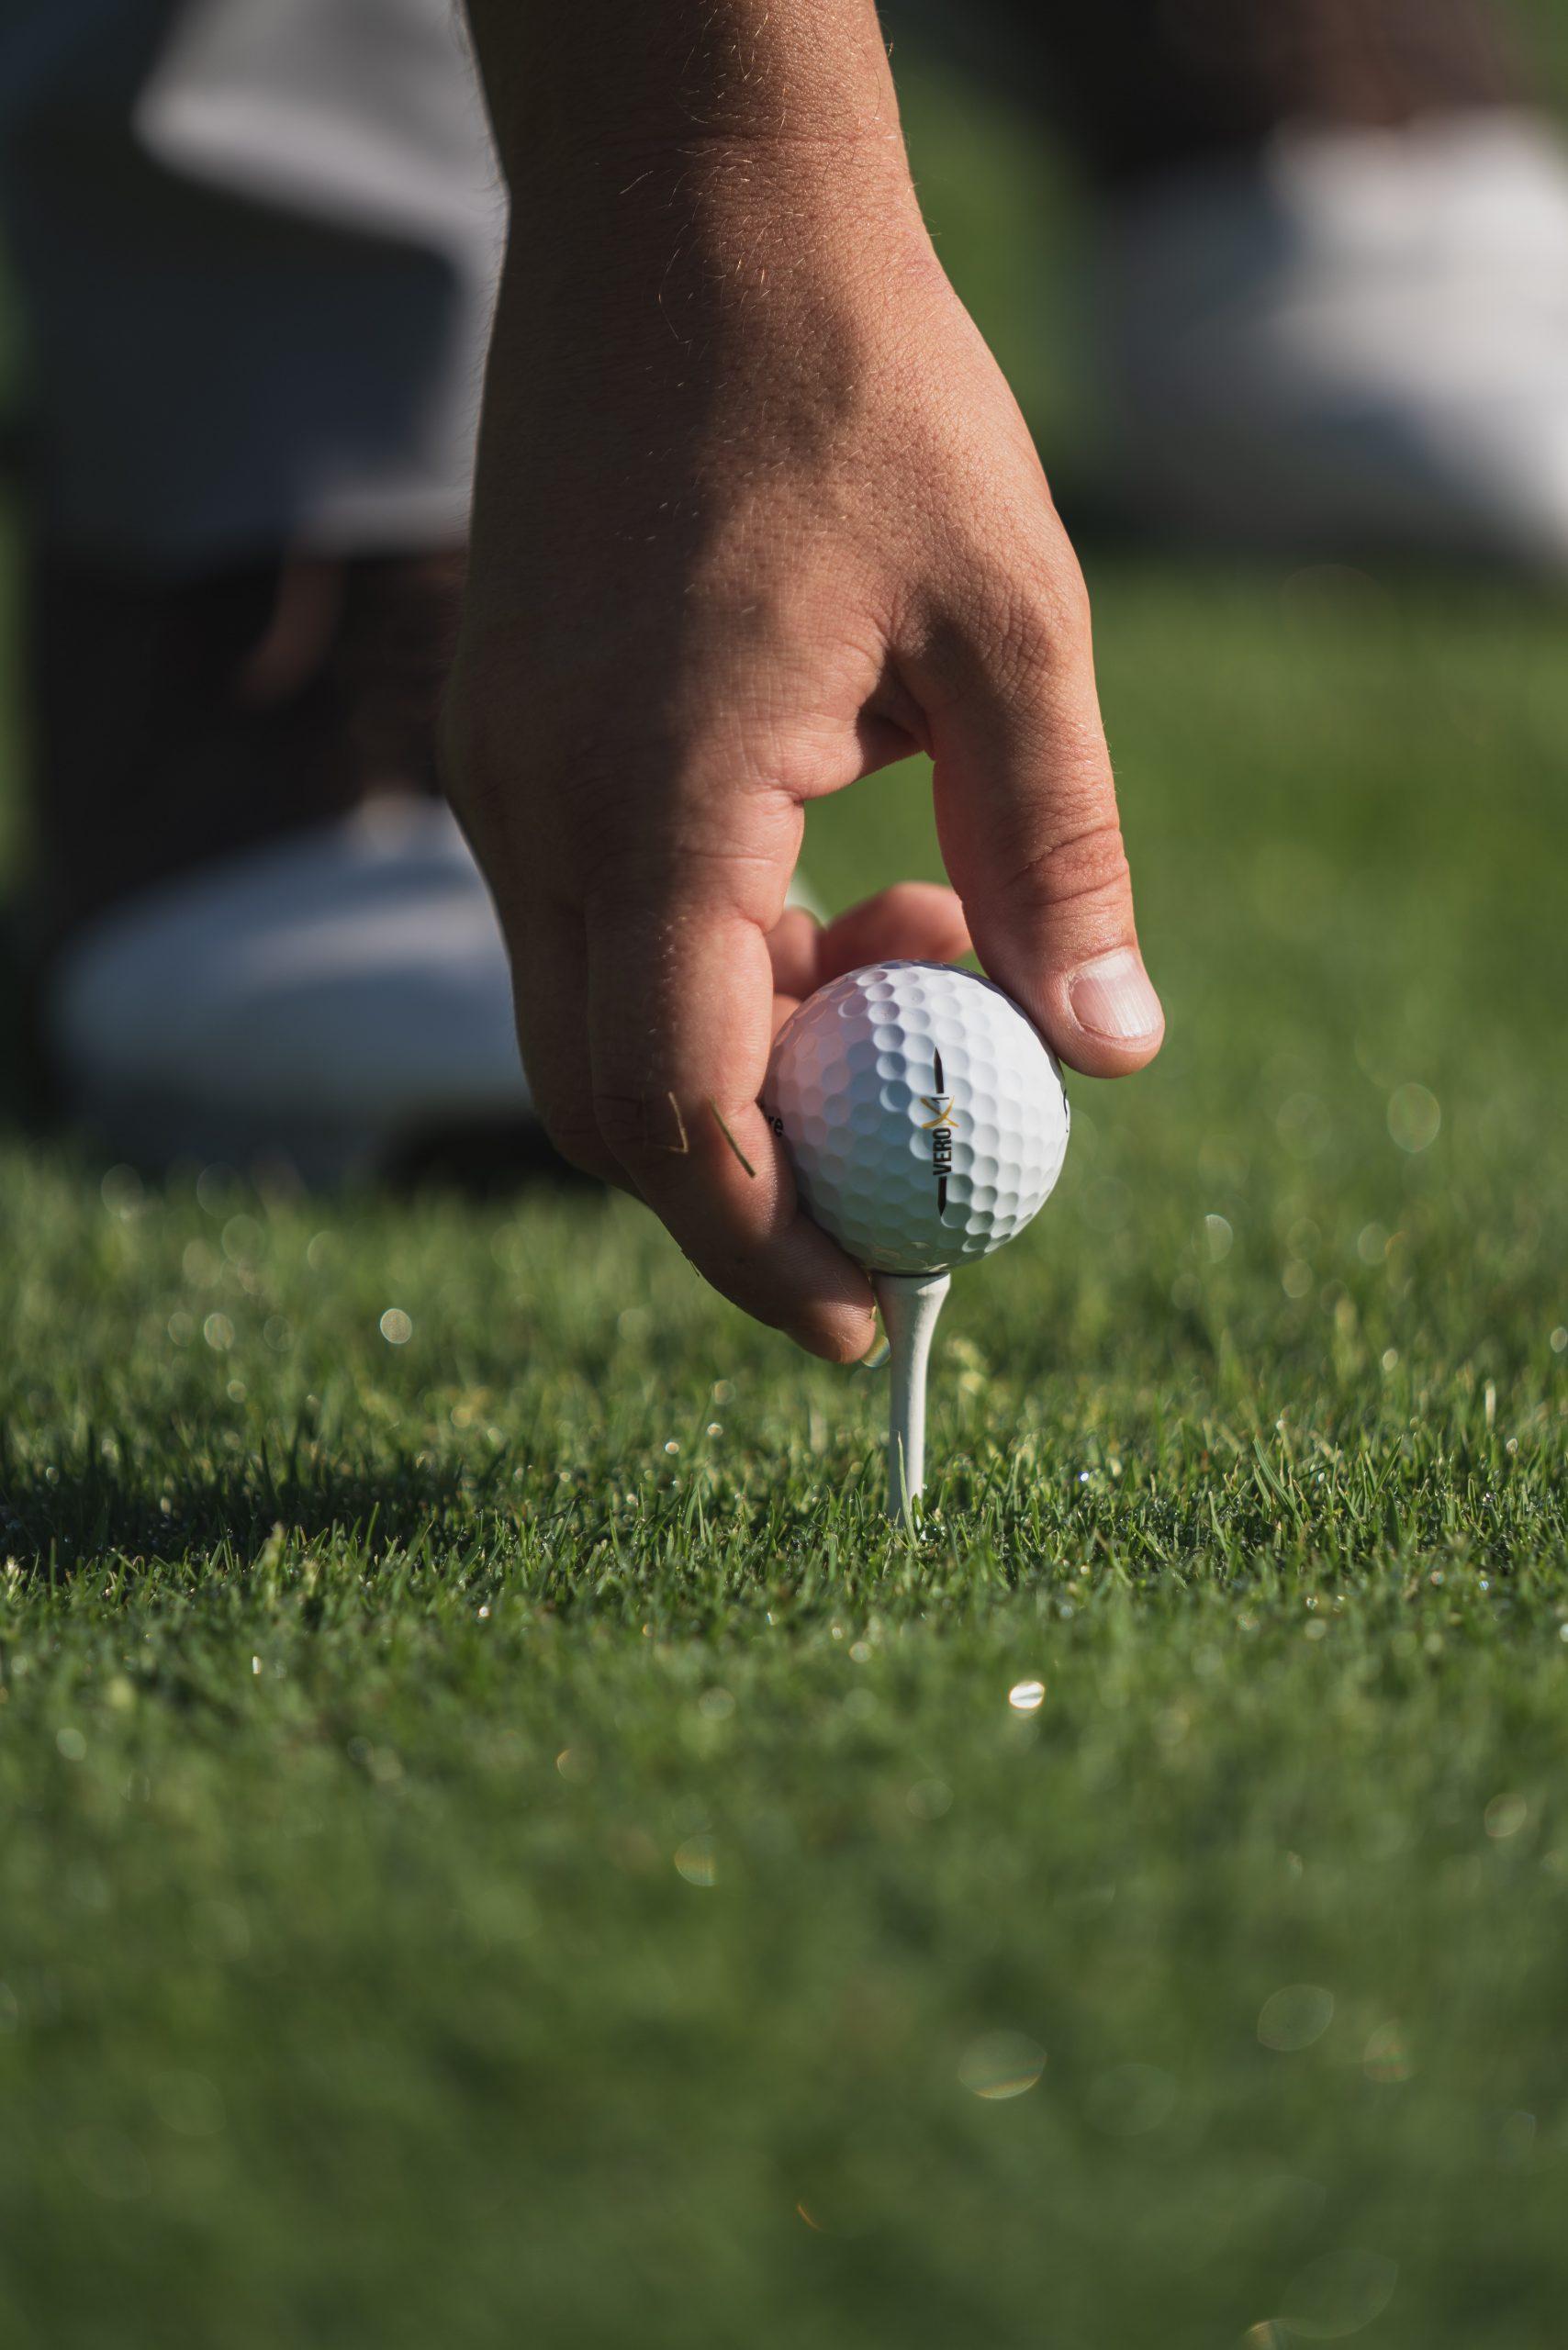 Reasons to Start Playing Golf